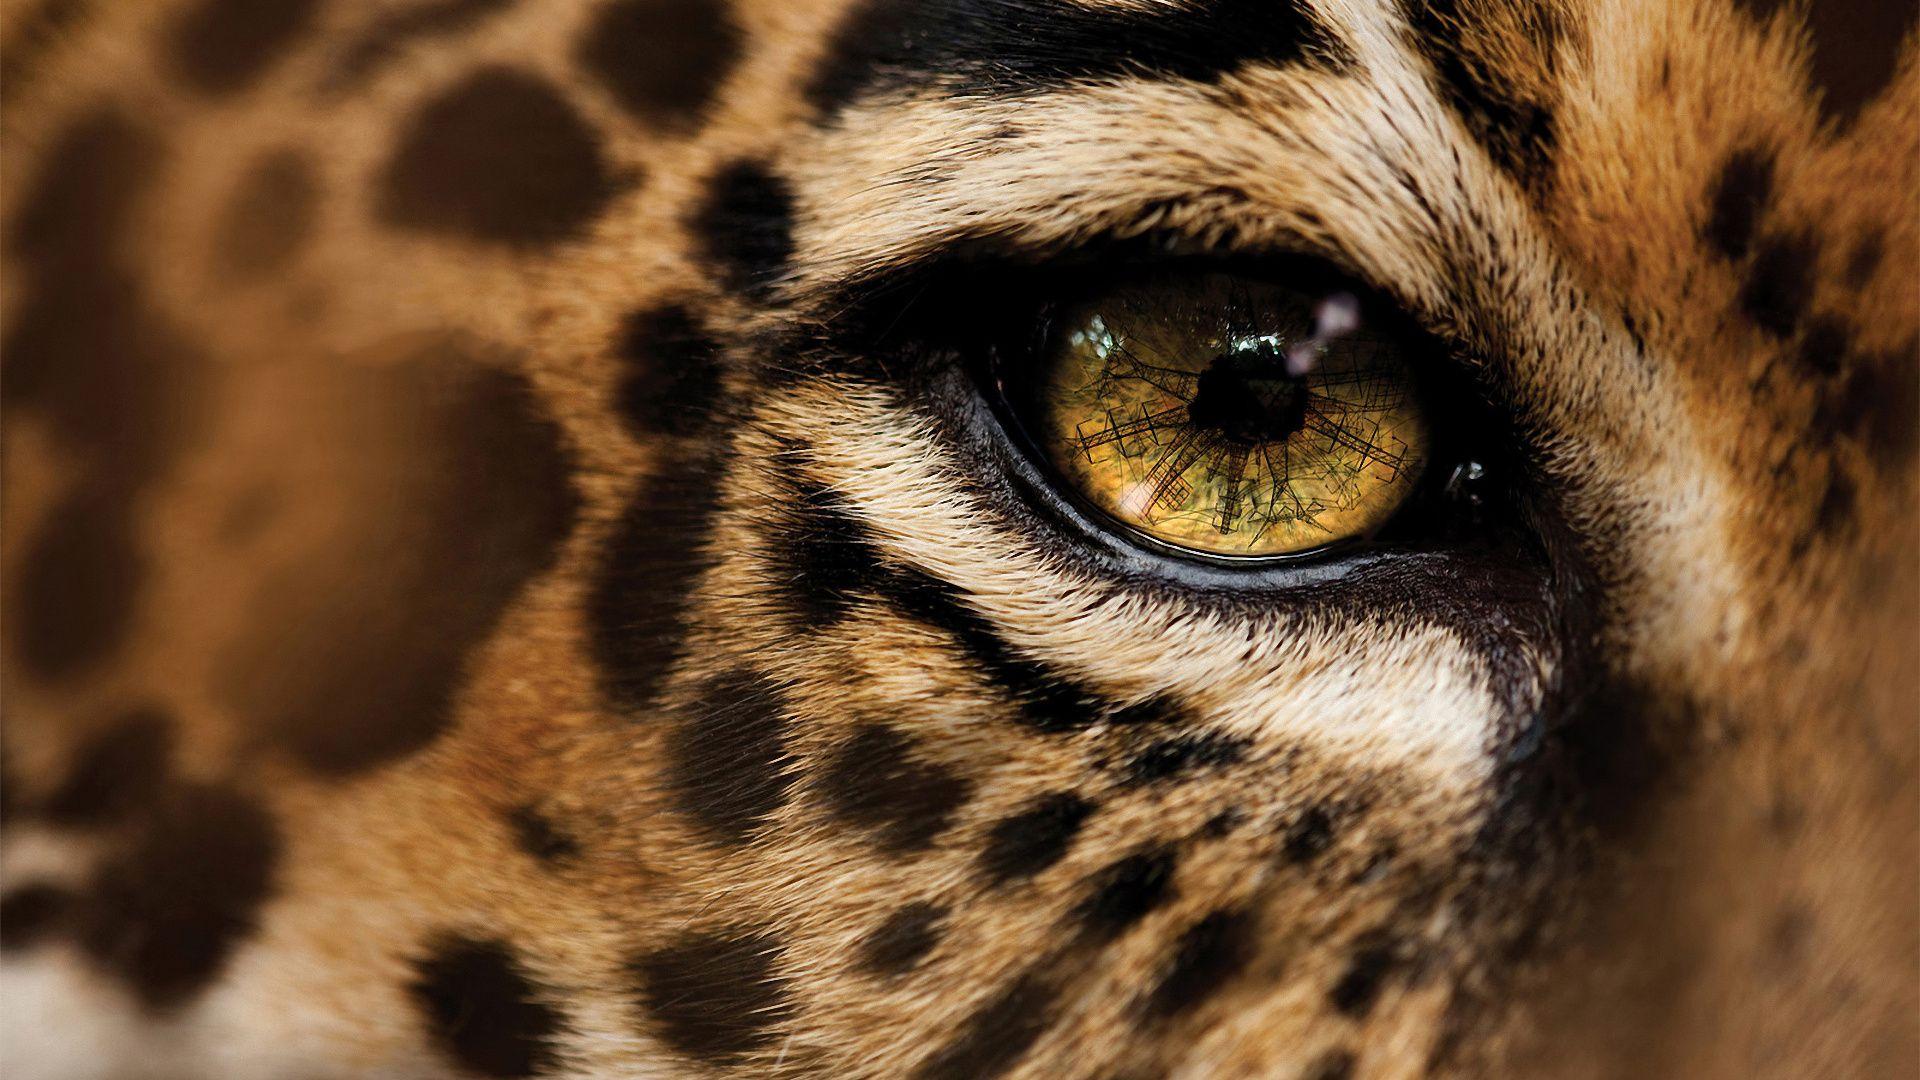 Cheetah Computer Wallpapers Desktop Backgrounds ID 1920x1200 Images 44